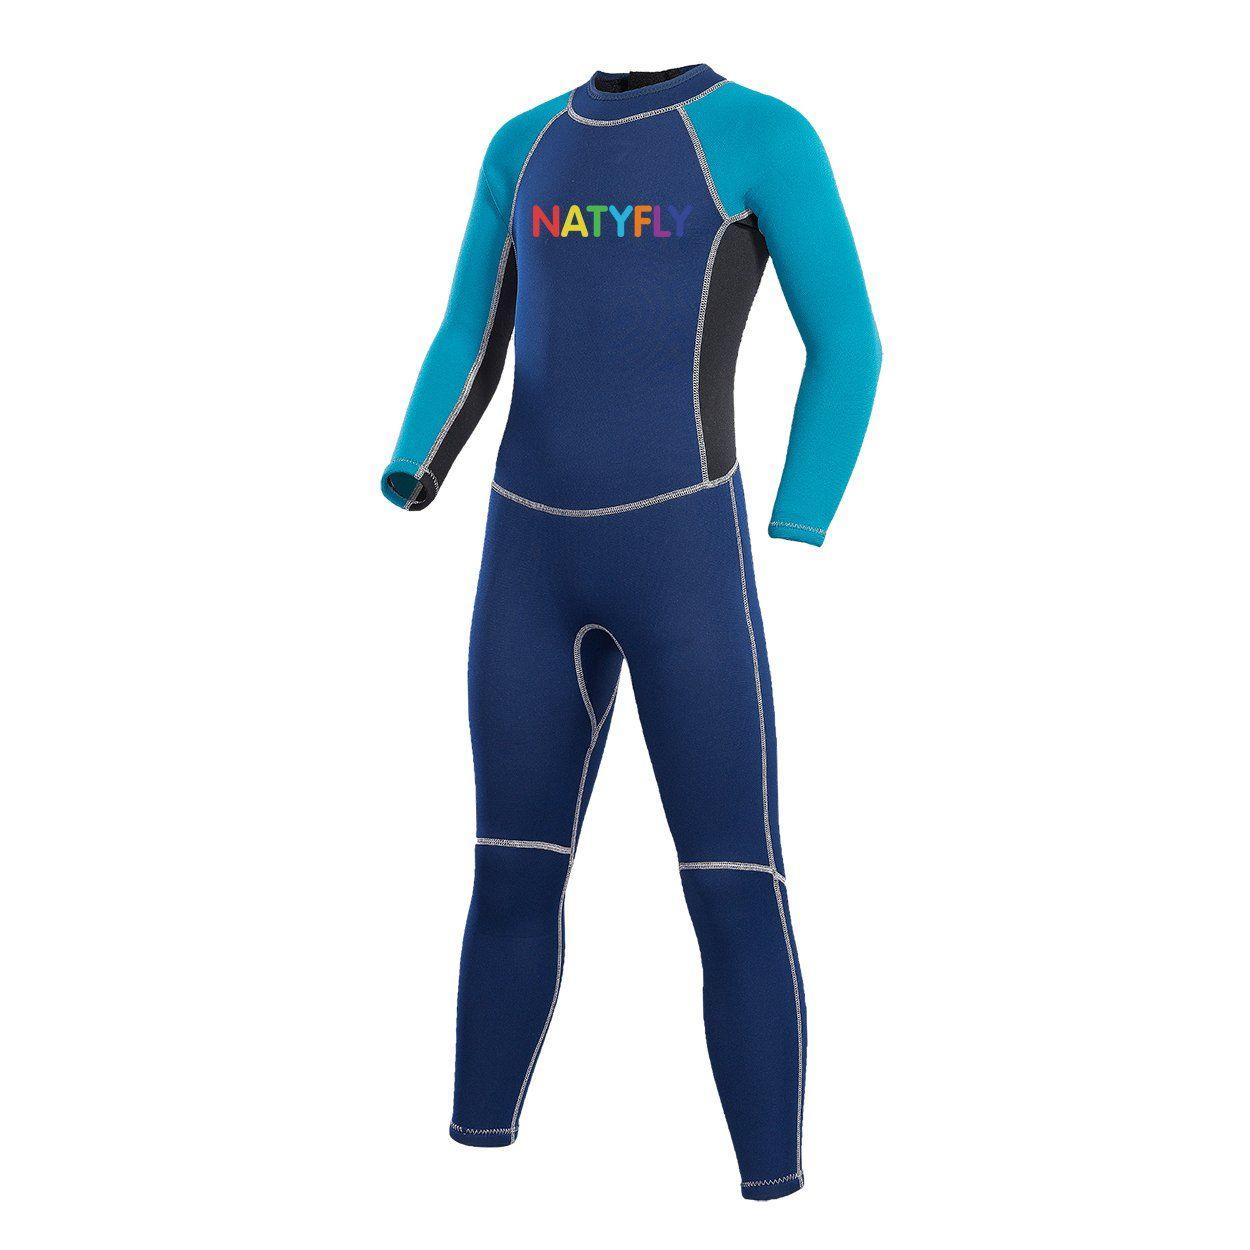 Layatone Wetsuit Jacket Adults 3mm Neoprene Top Surfing Scuba Diving Top Jacket Women Men Rash Guard Long Sleeves Front Zipper Wet Suits Top Adults Pink - Neoprene Sleeve,XL